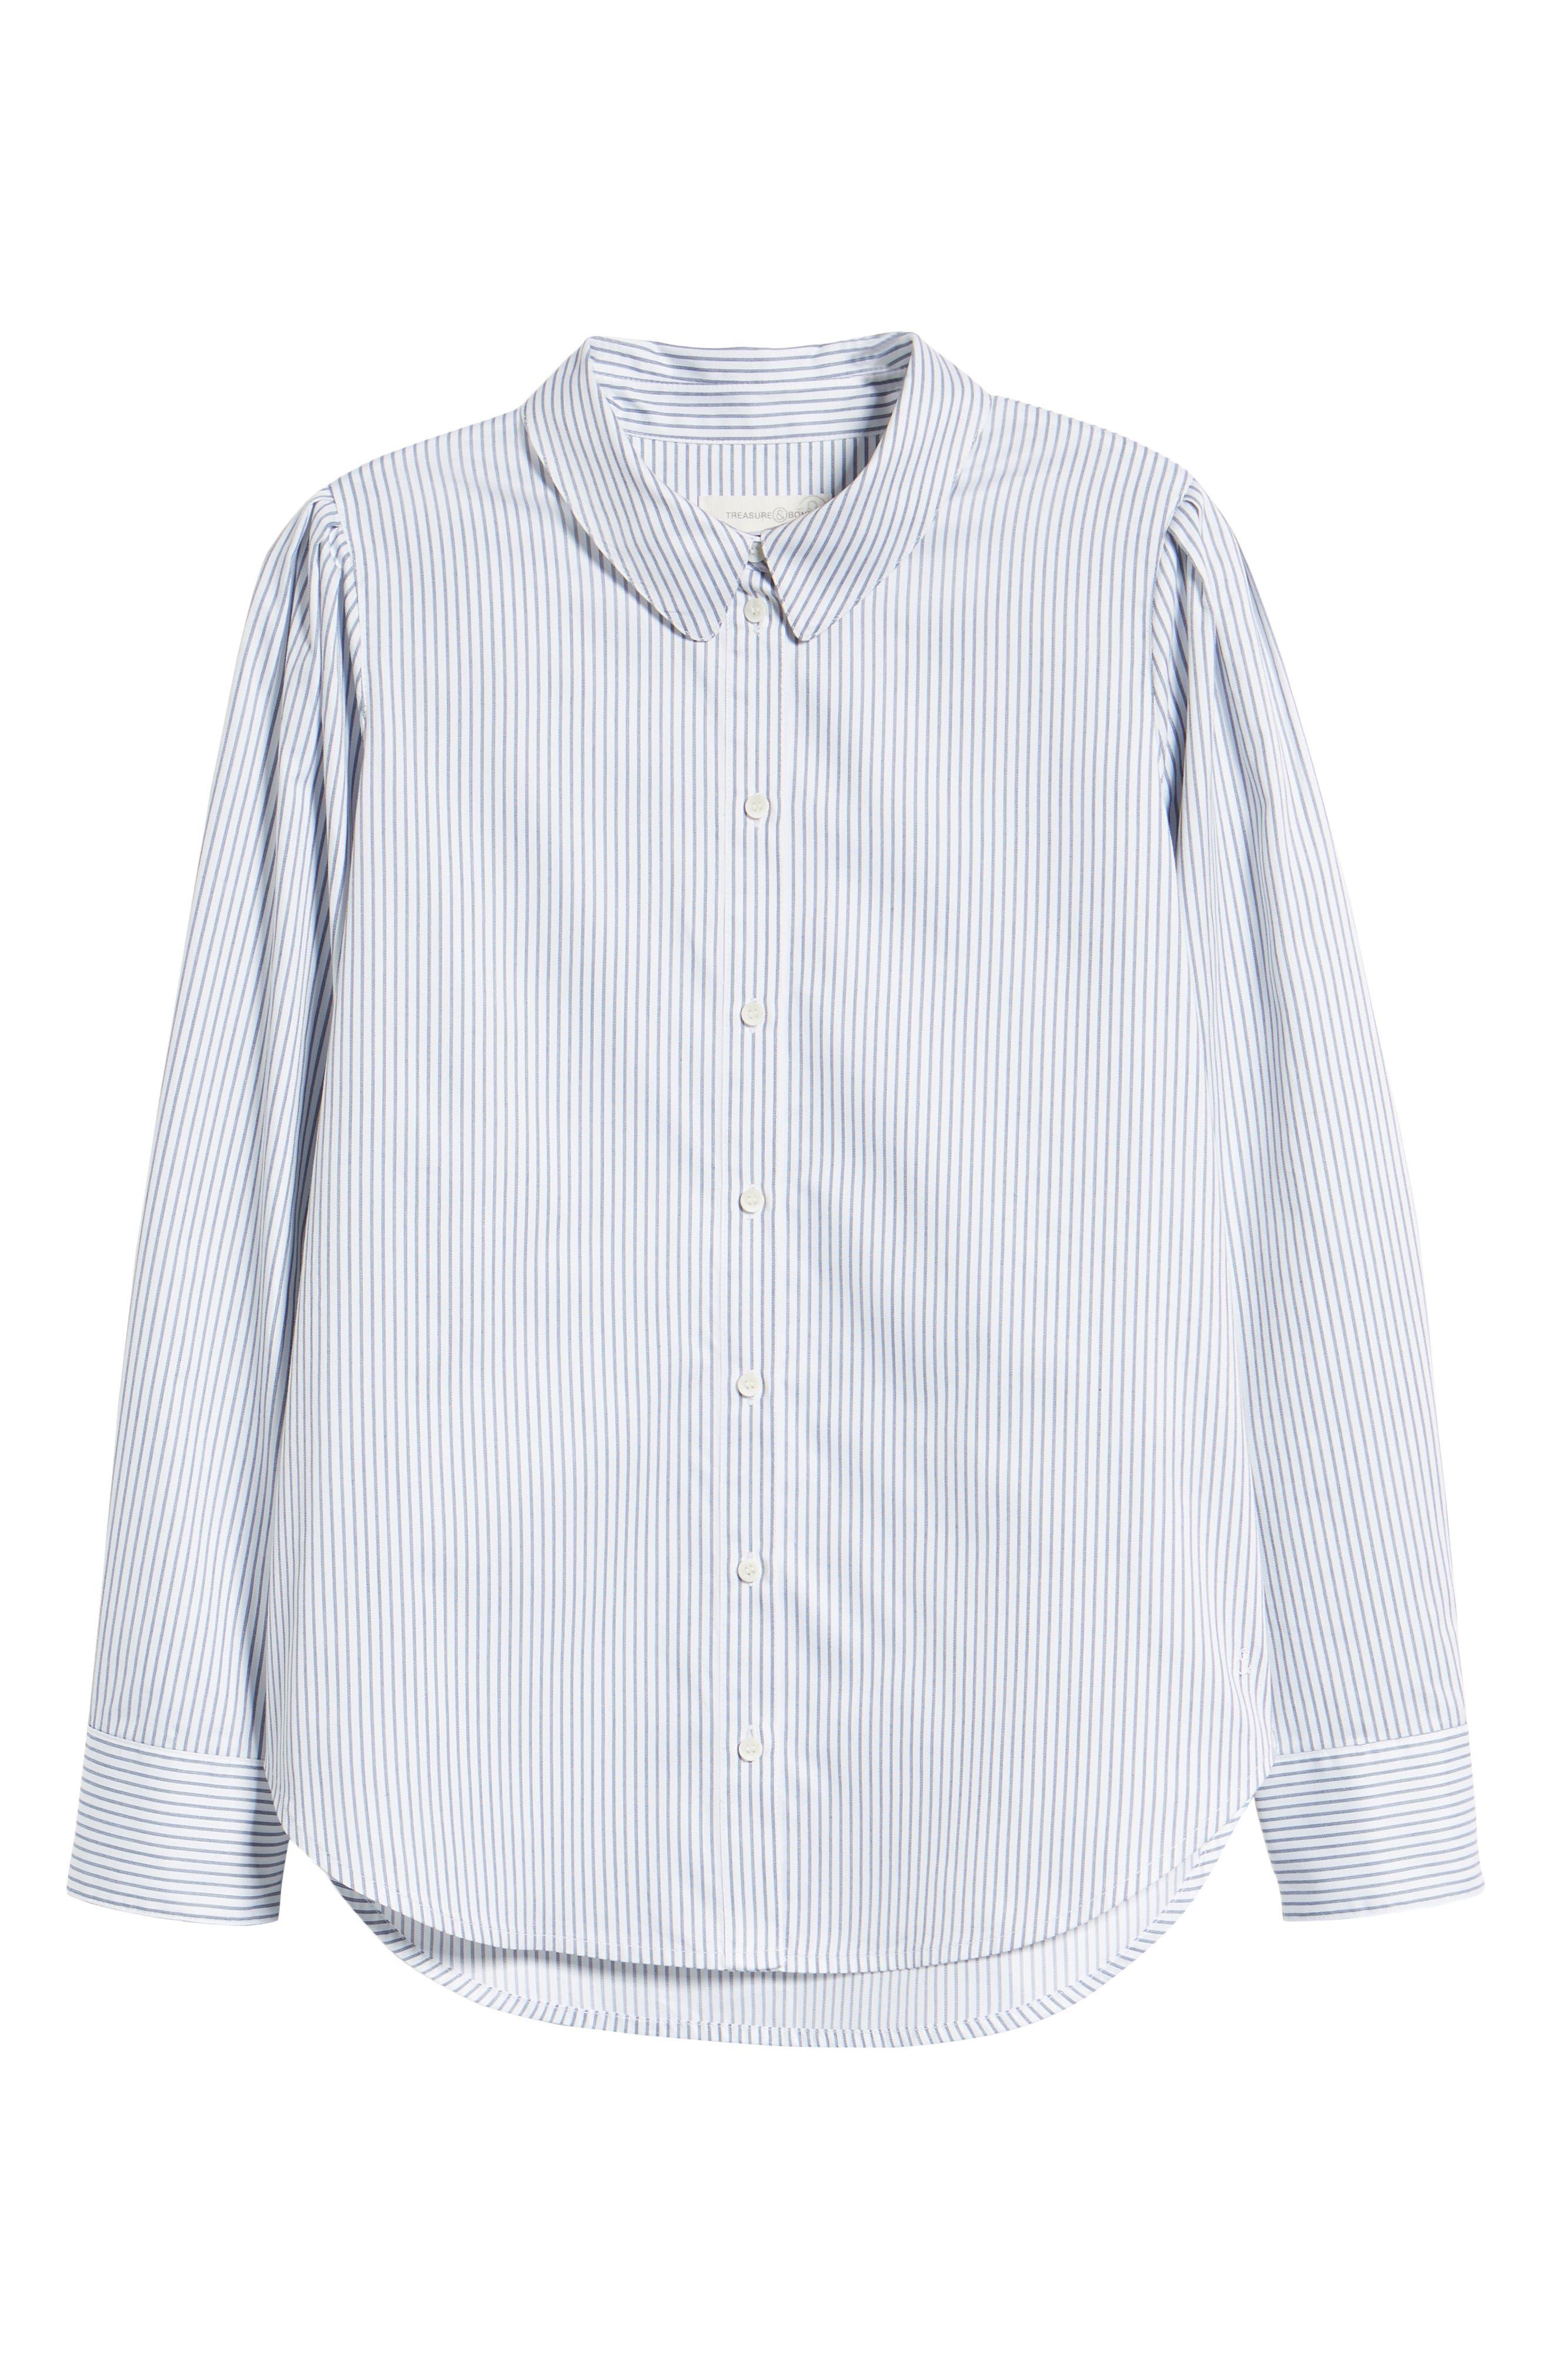 Pleated Sleeve Stripe Shirt,                             Alternate thumbnail 6, color,                             WHITE STOCKHOLM STRIPE